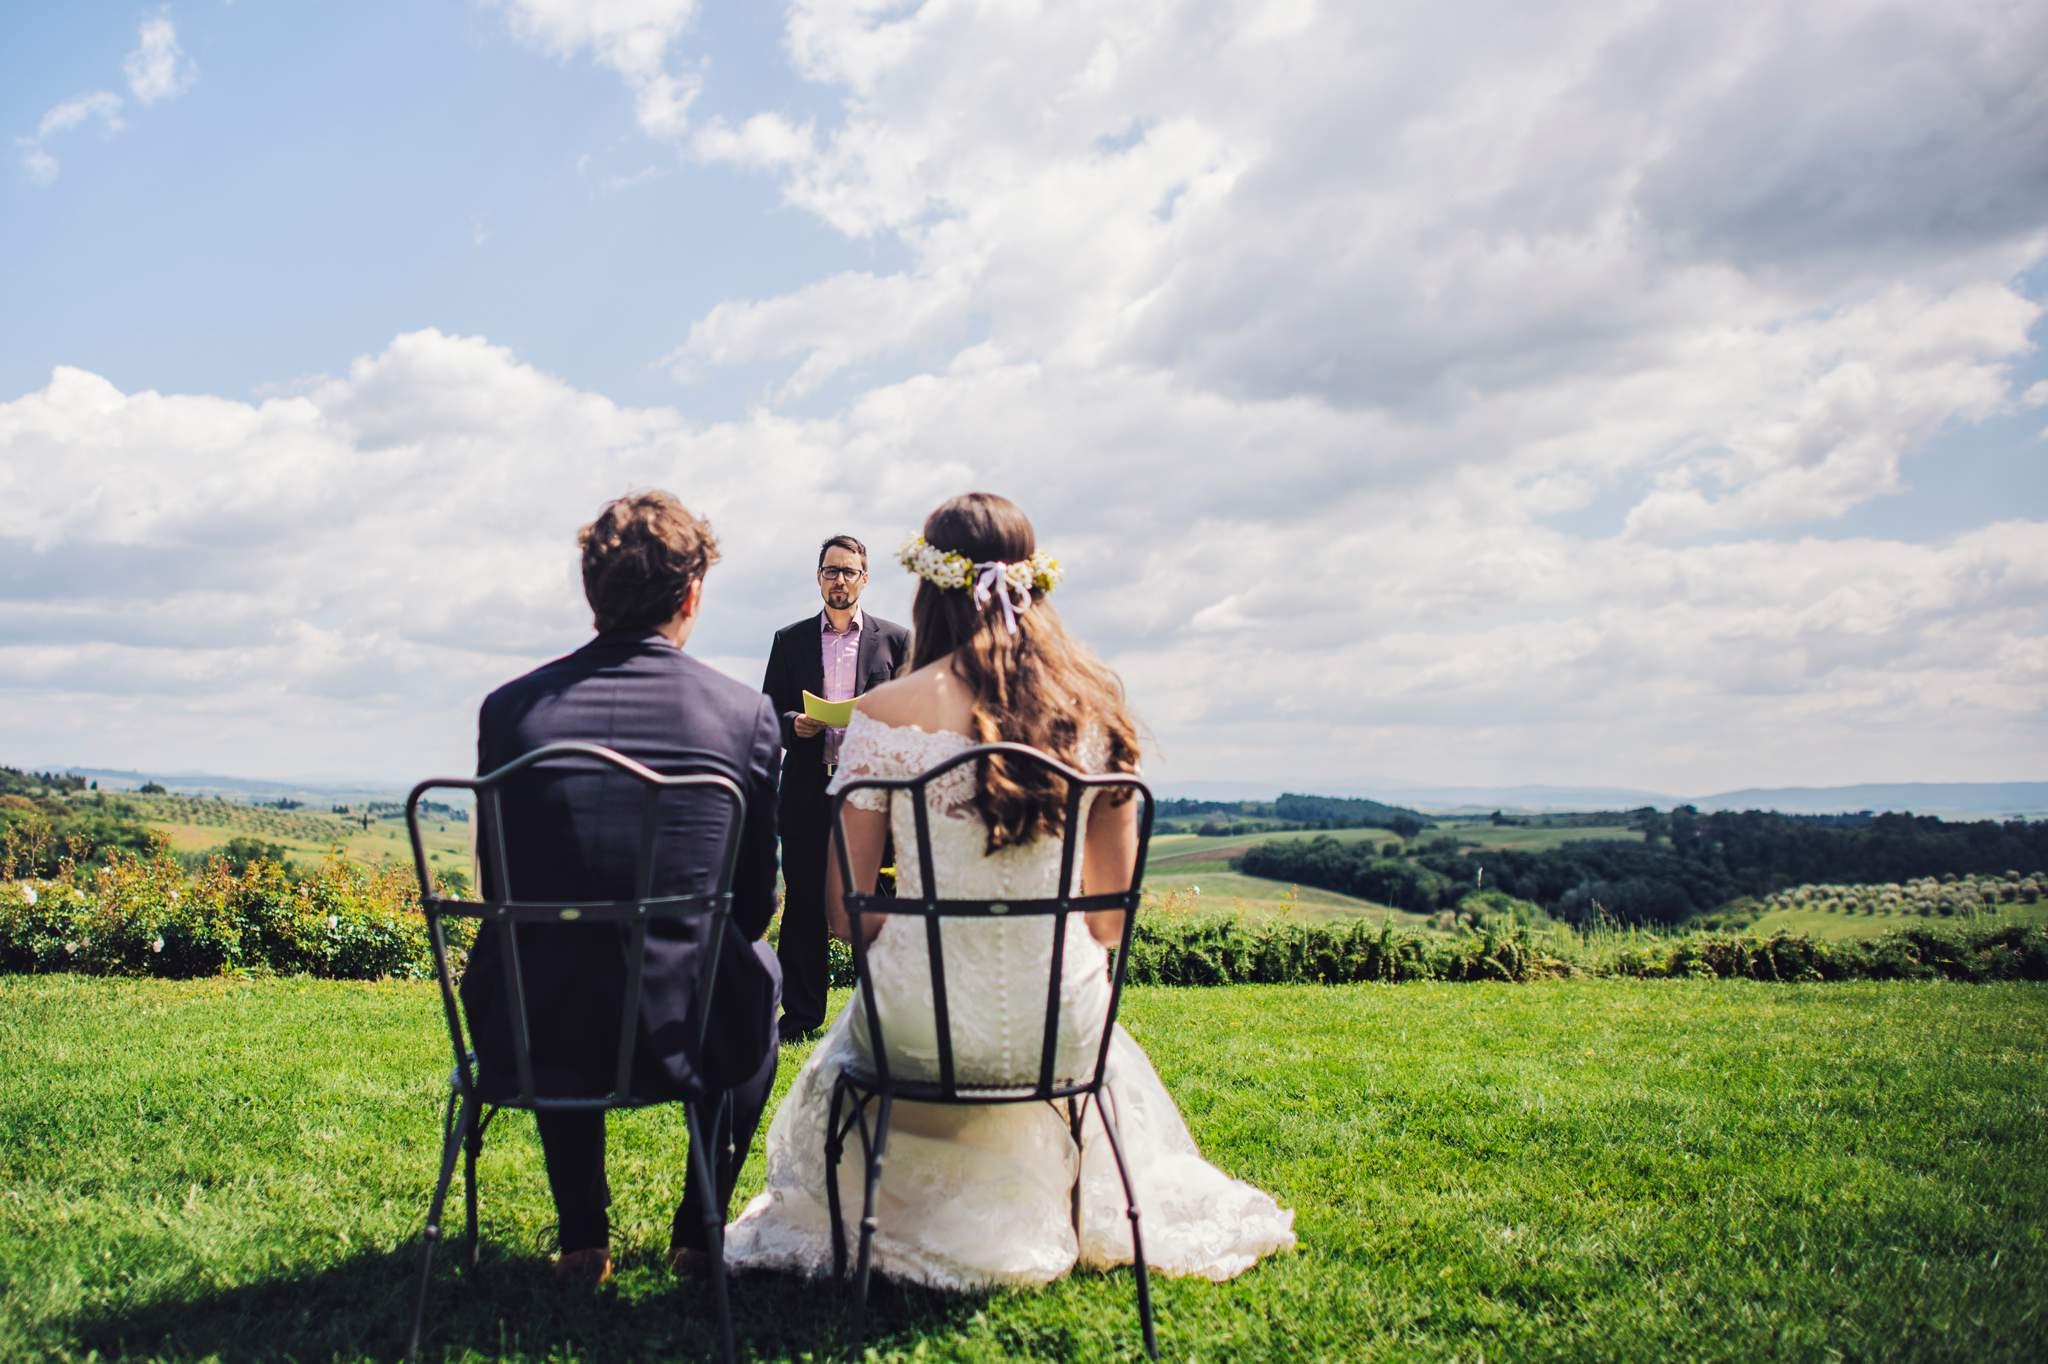 16wedding-photographer-tuscany-siena